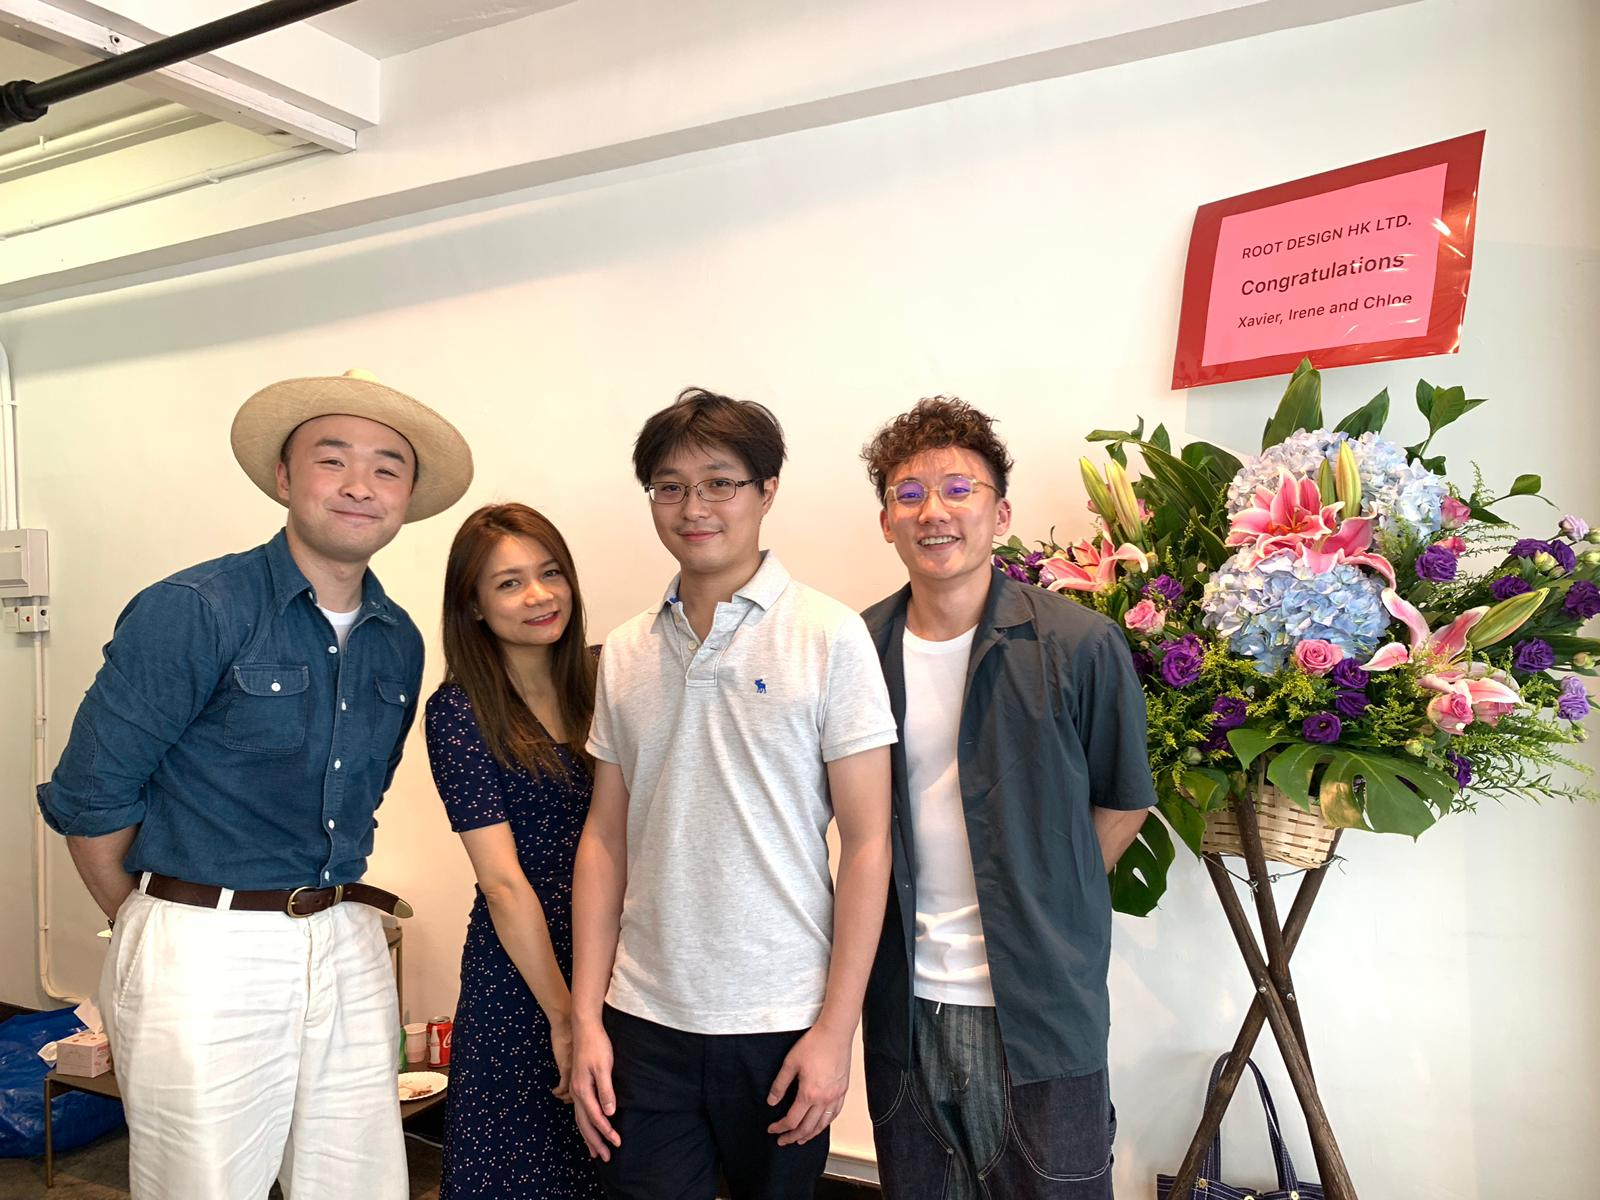 Anya Wu, Design Director of Root Design HK Limited, Hong Kong